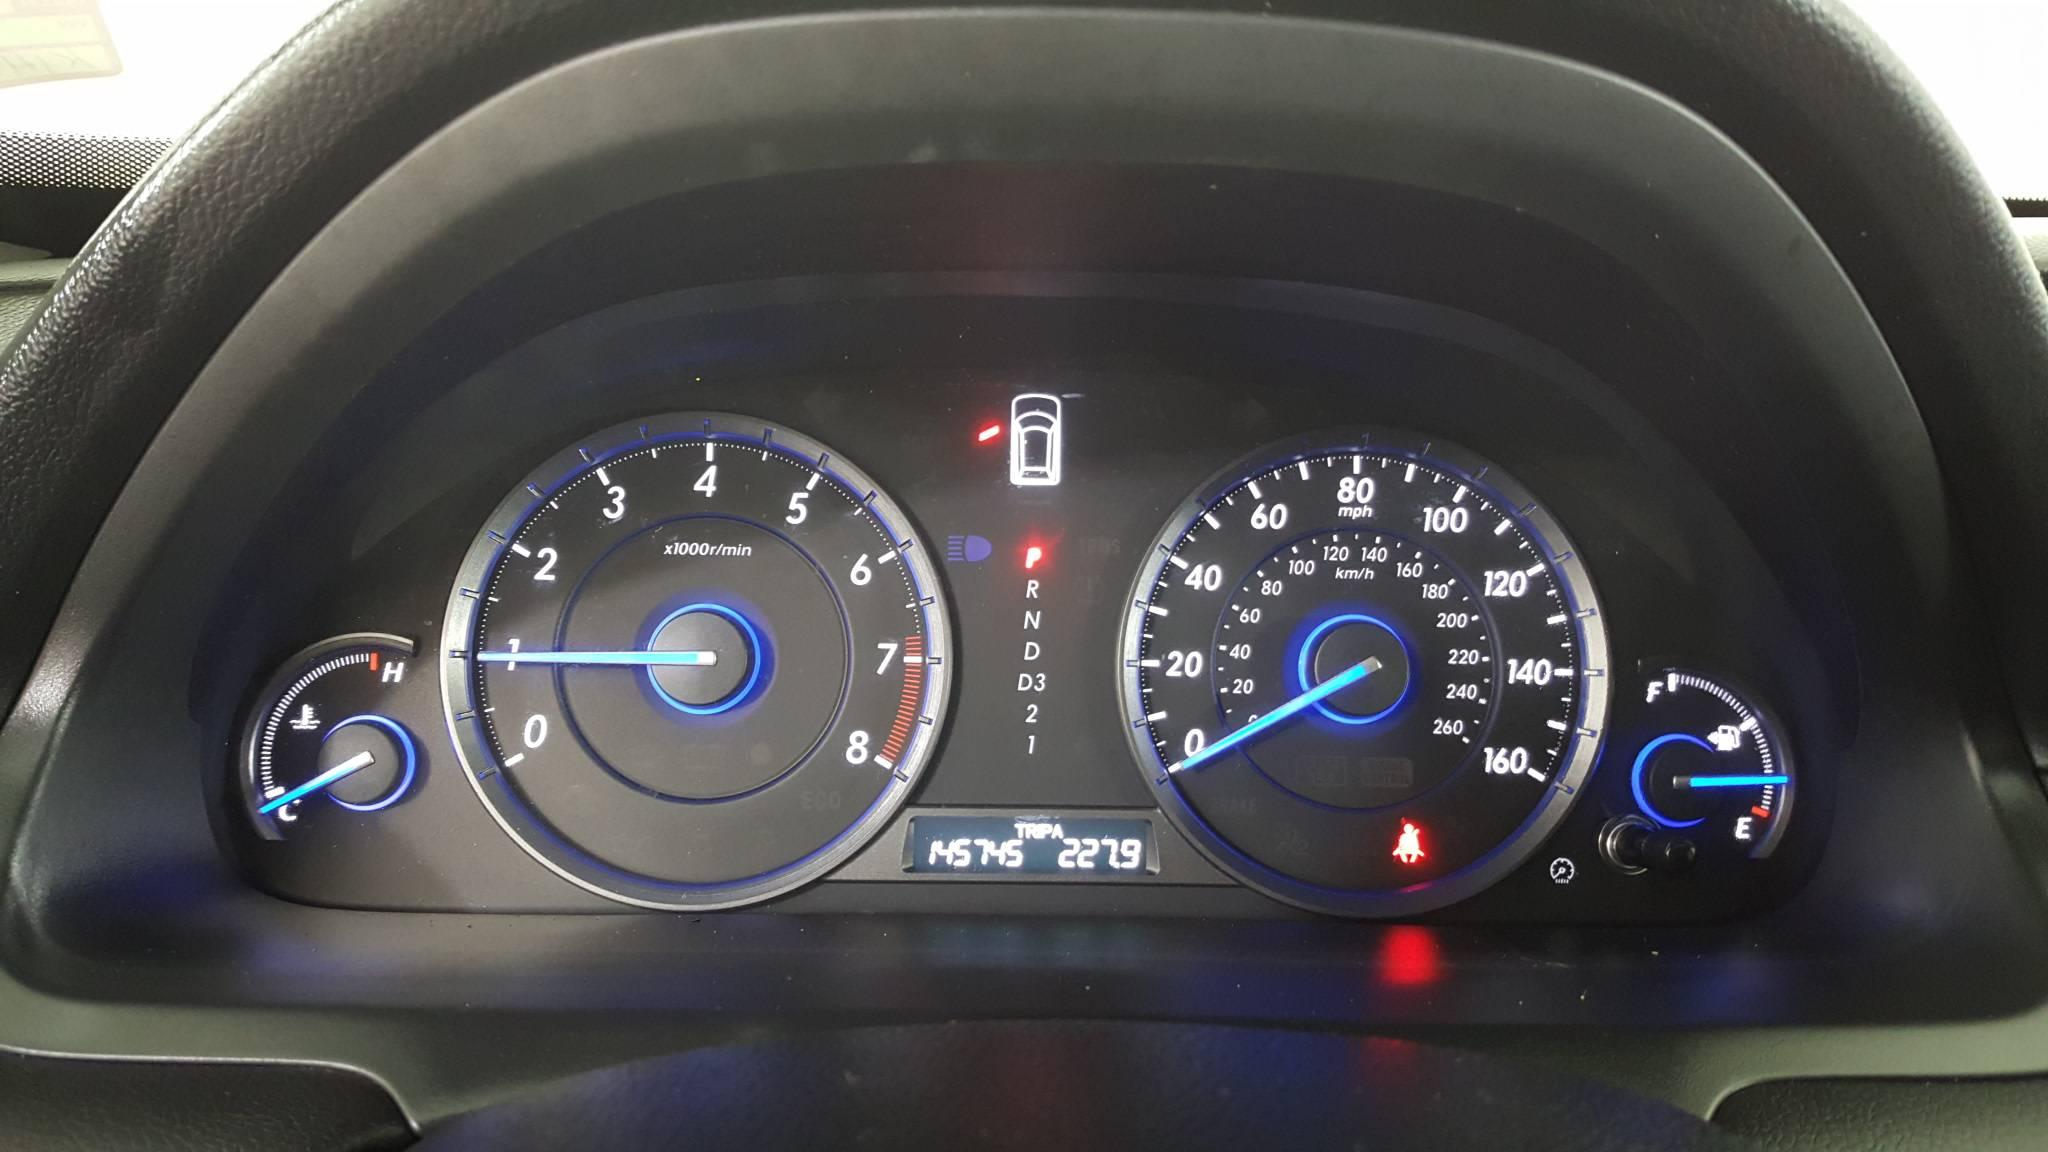 Pre-Owned 2010 Honda Accord Crosstour EX-L